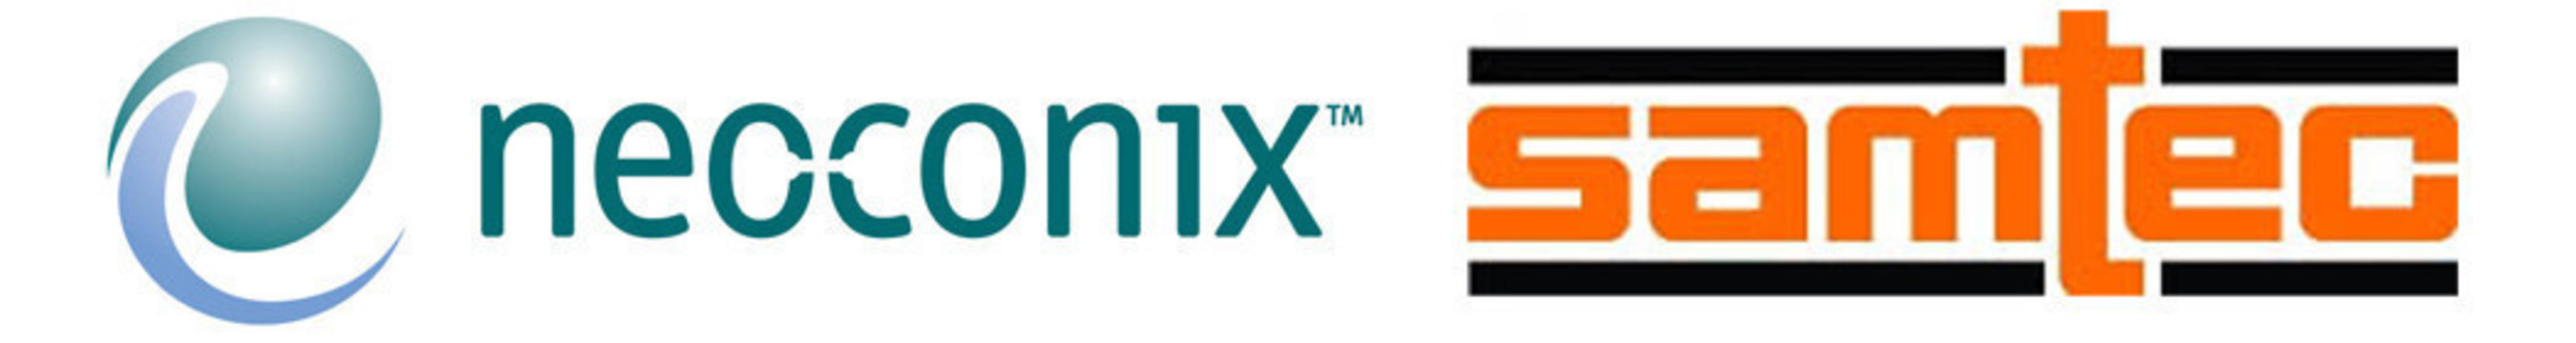 Neoconix, Samtec Renew Technology License Agreement